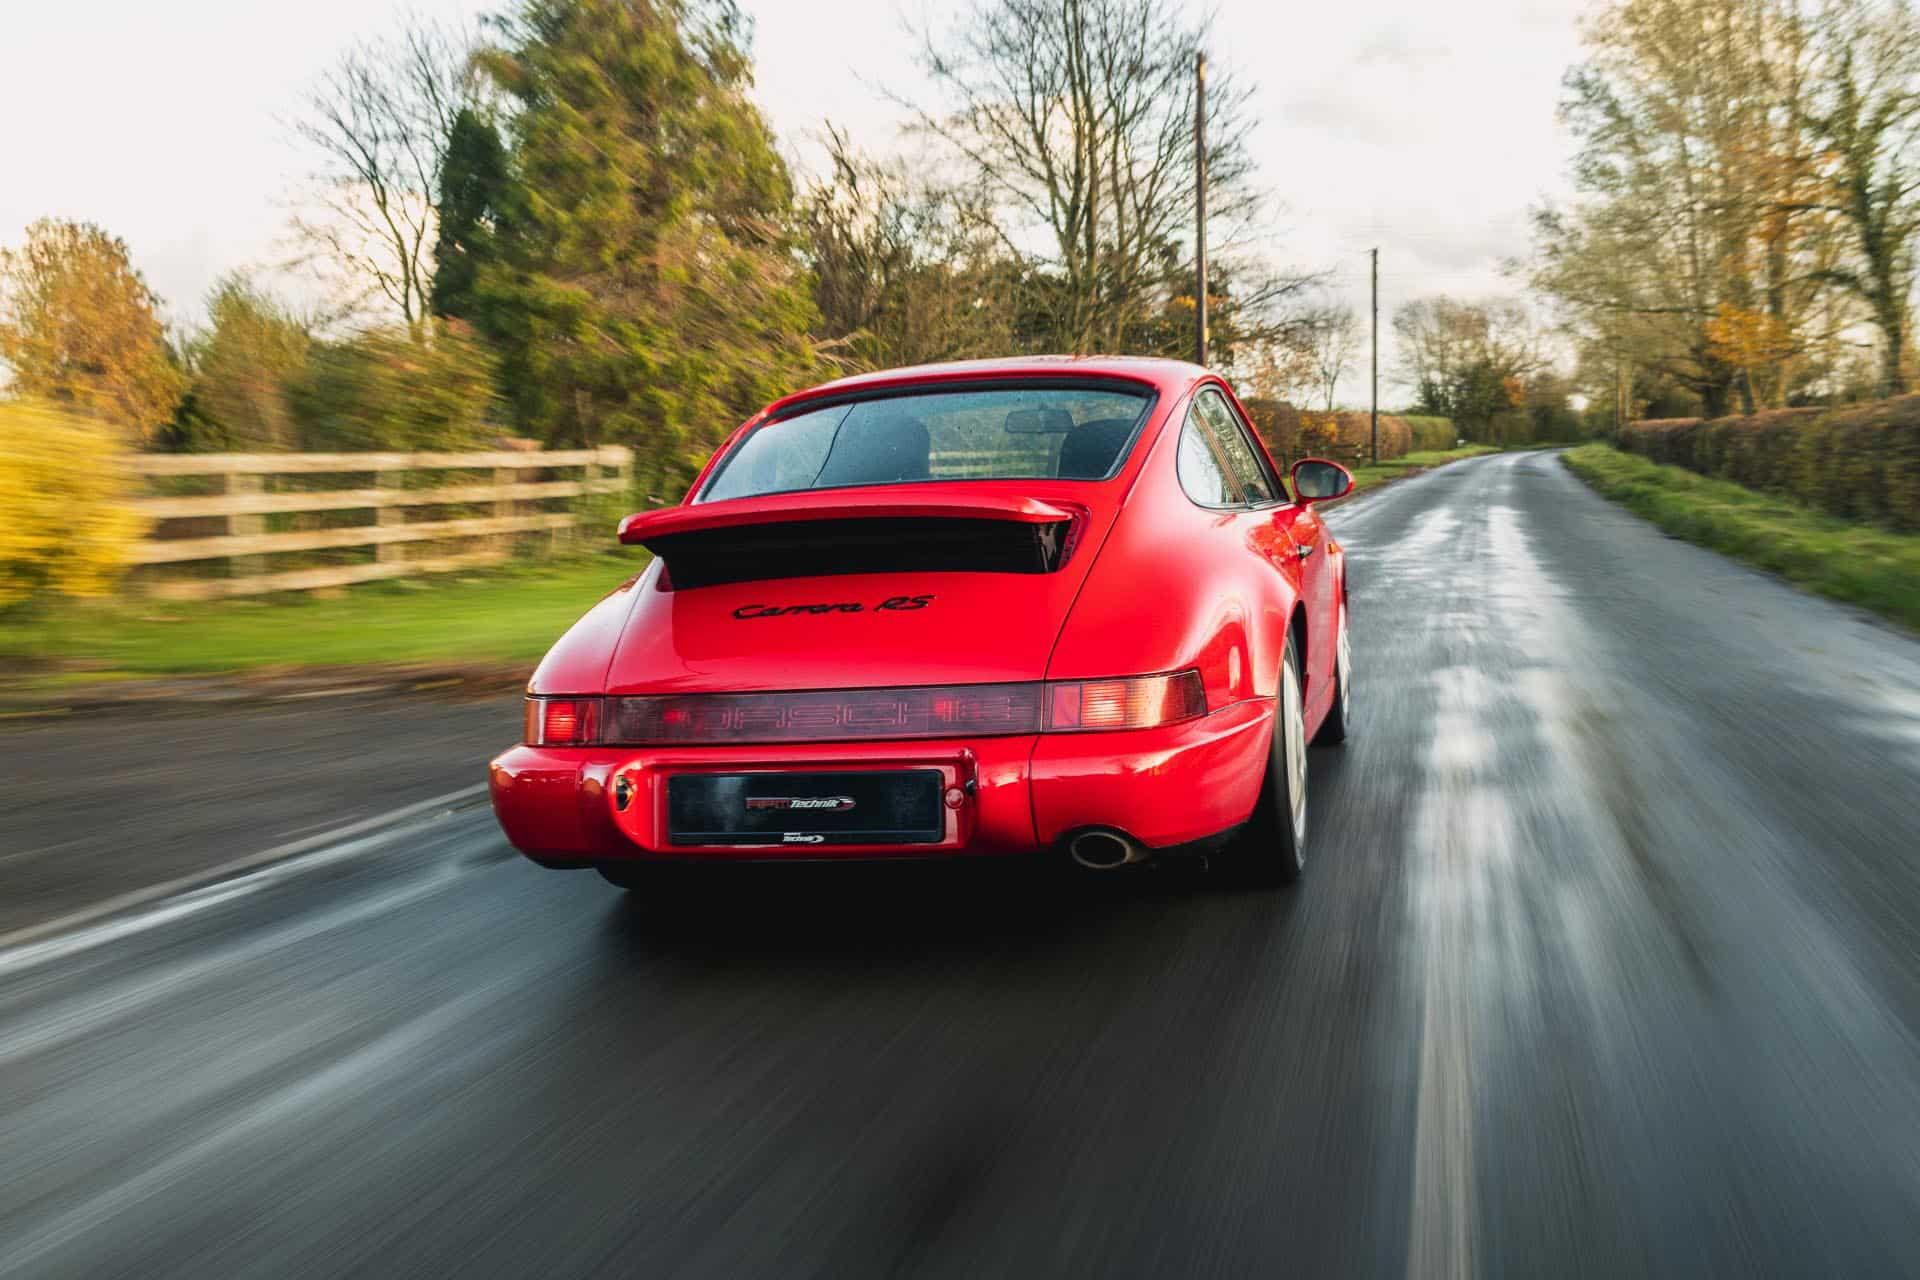 964-carrera-rs-driving-rpm